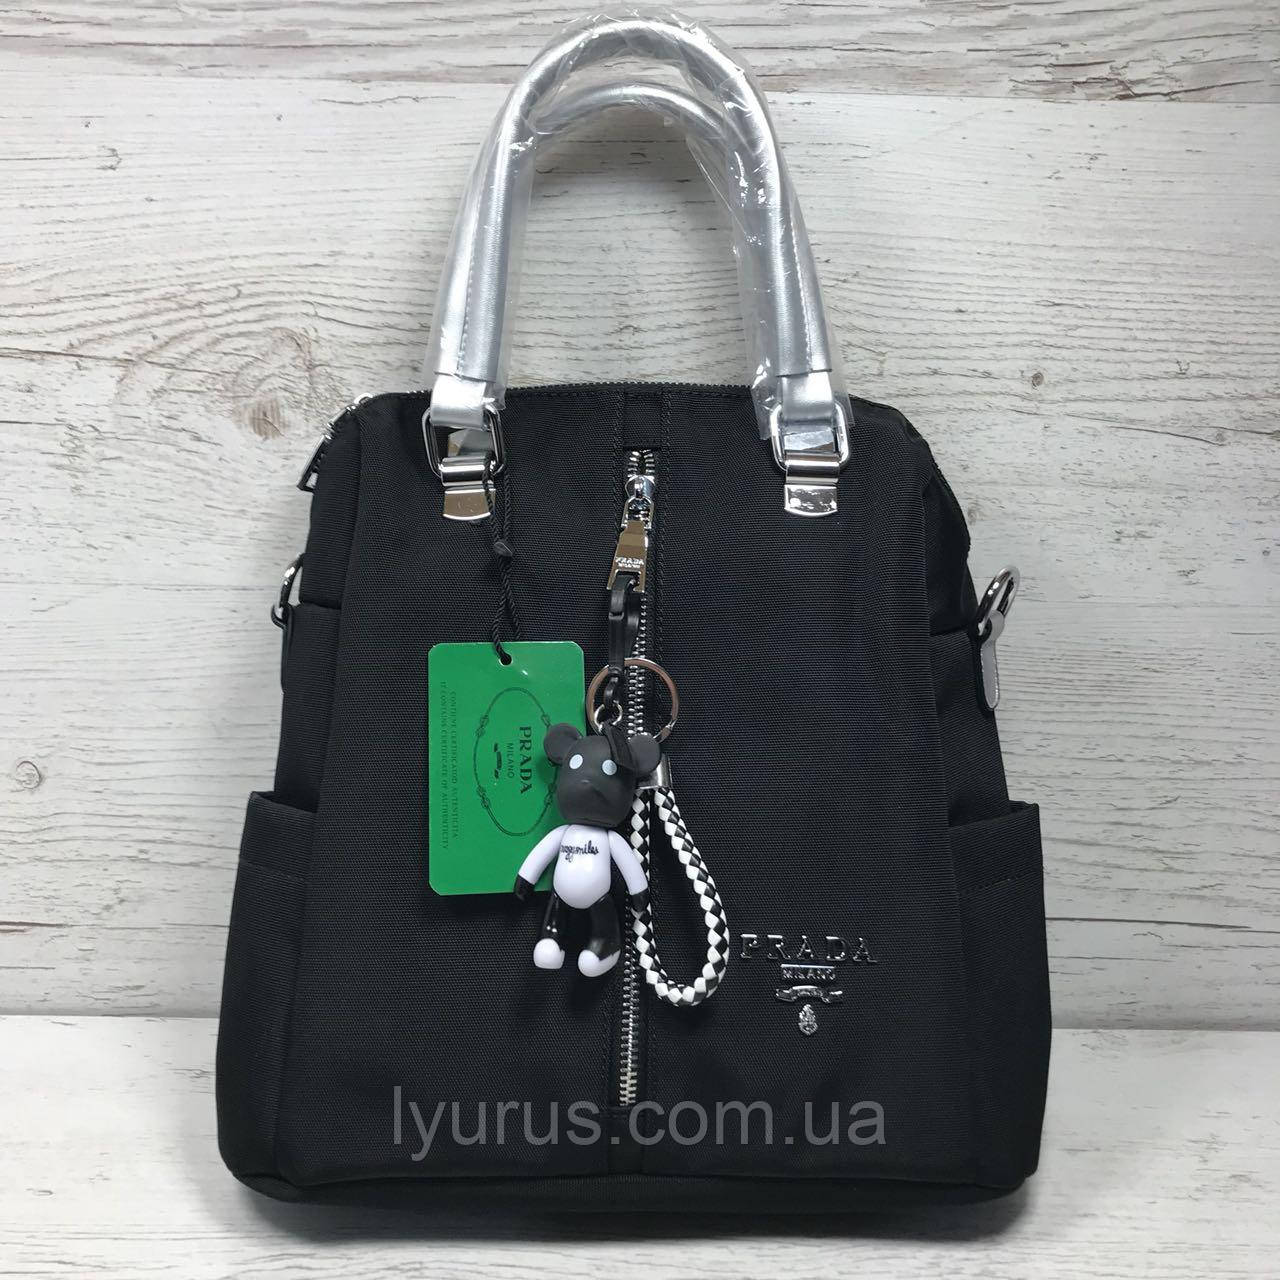 Сумка рюкзак  Prada